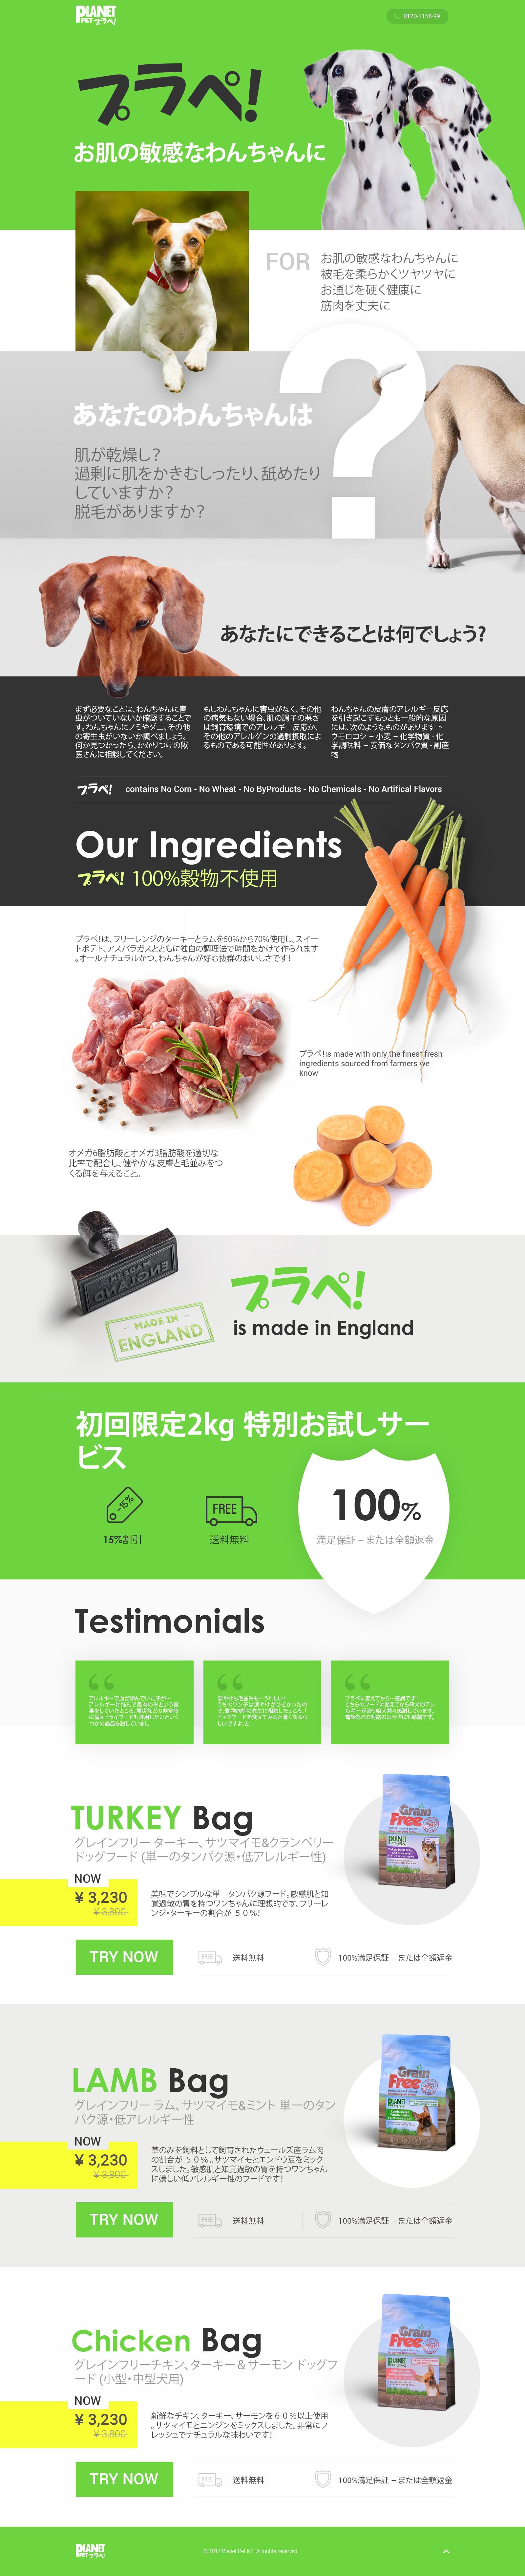 Design a Planet Pet product landing page for Japan !